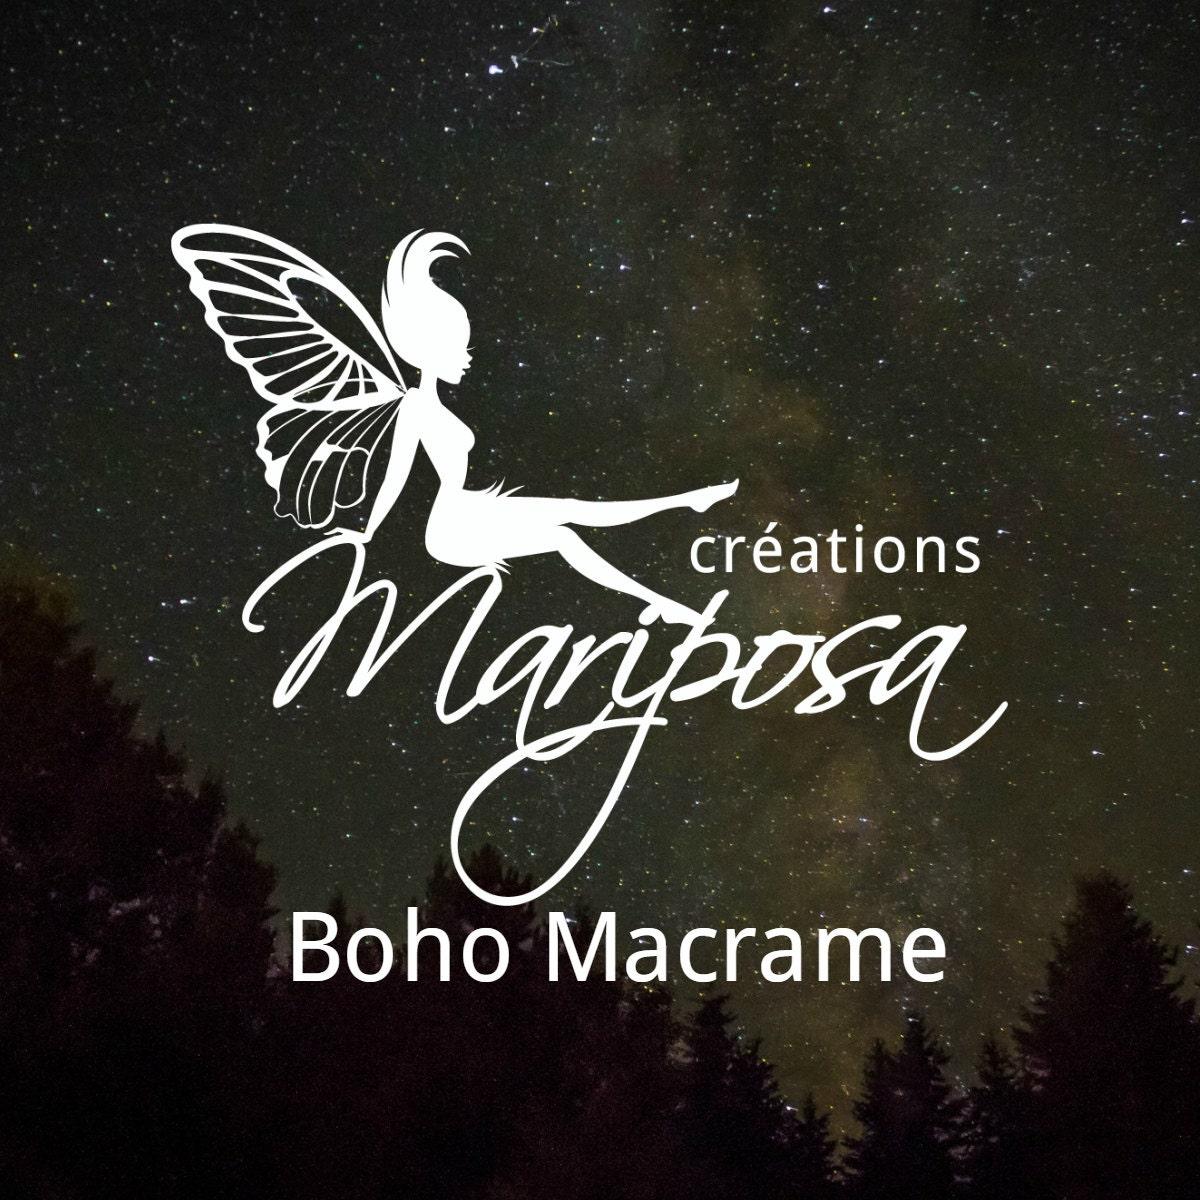 MariposaMacrame